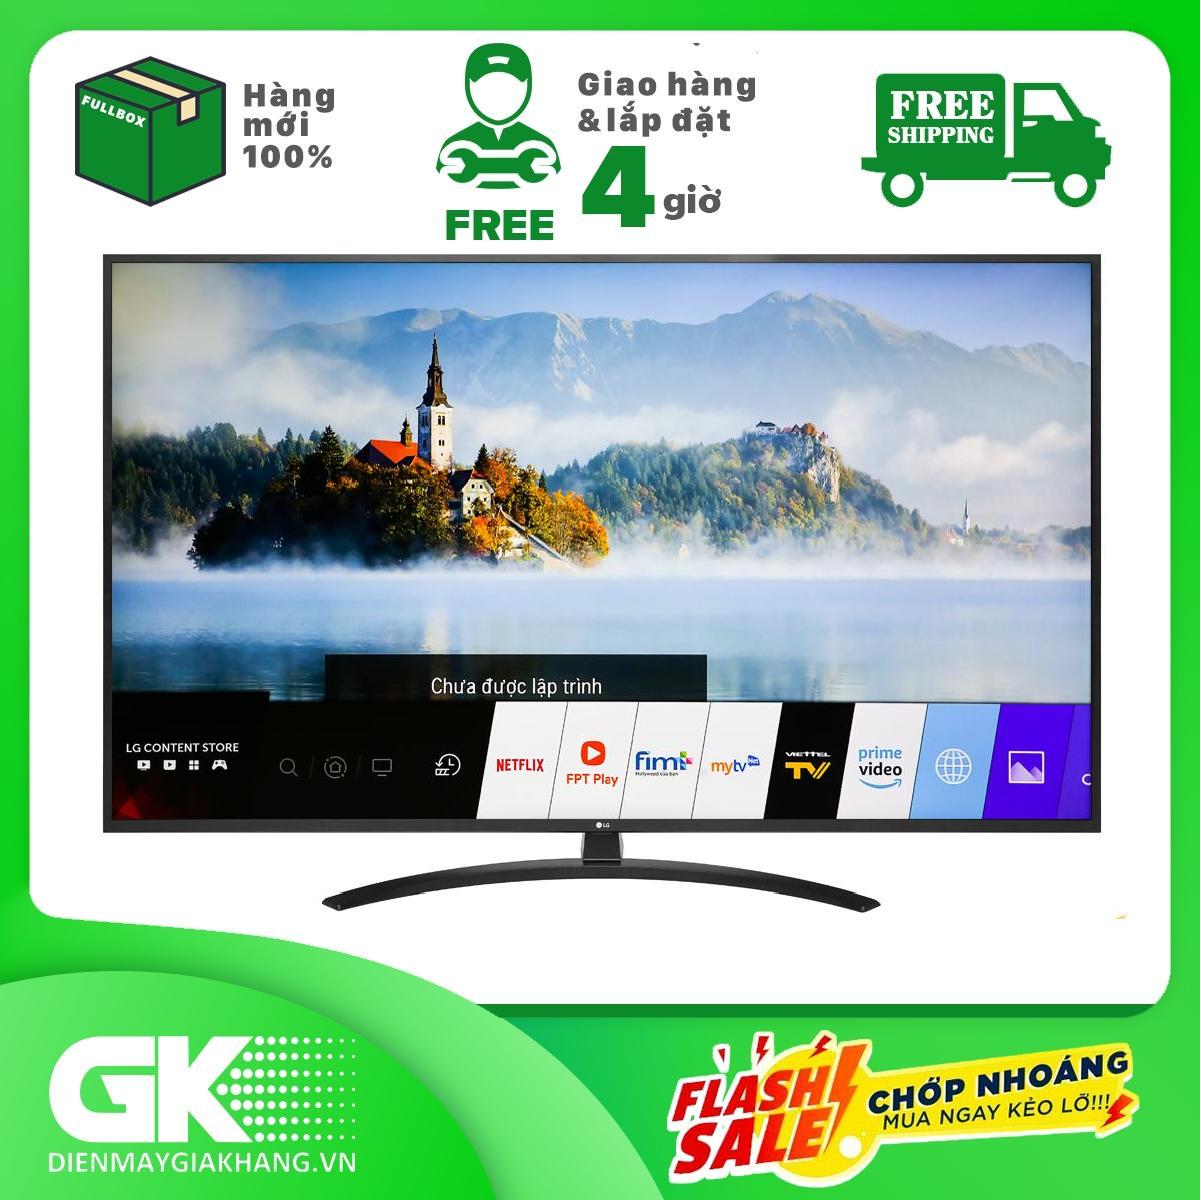 Smart Tivi LG 4K 65 inch 65UM7400PTA –